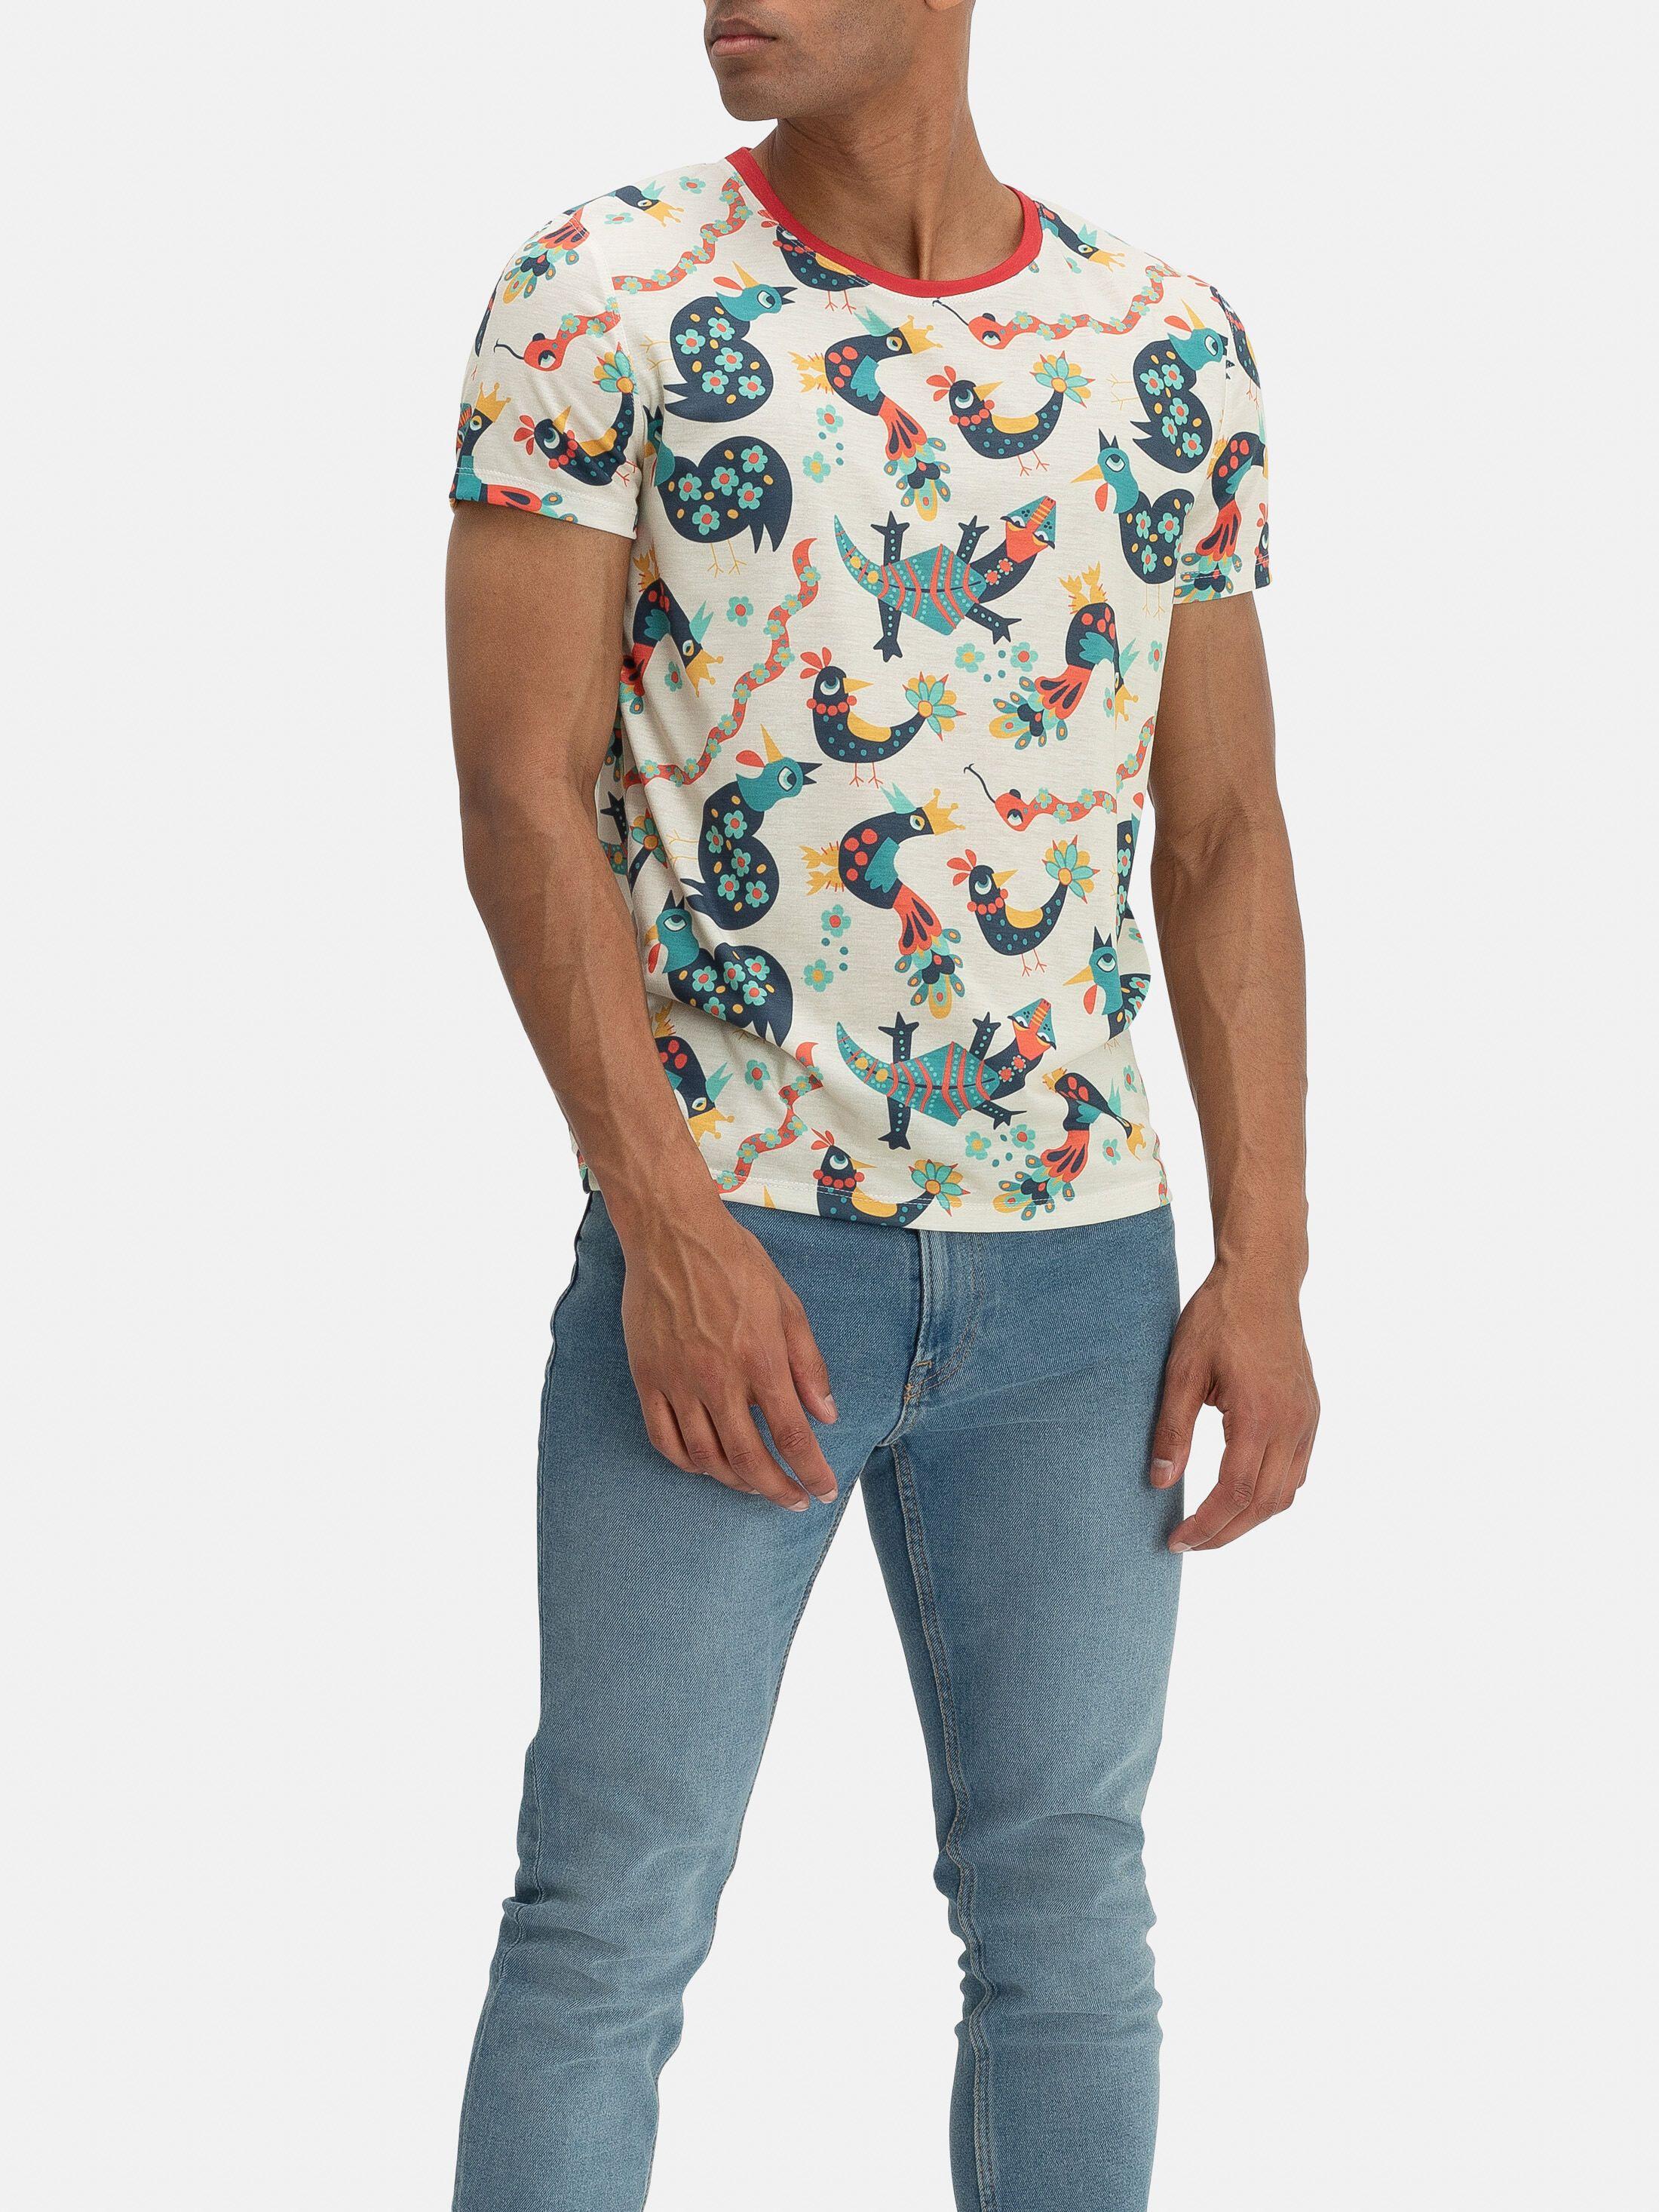 T Shirt Komplettdruck Kragen Detail